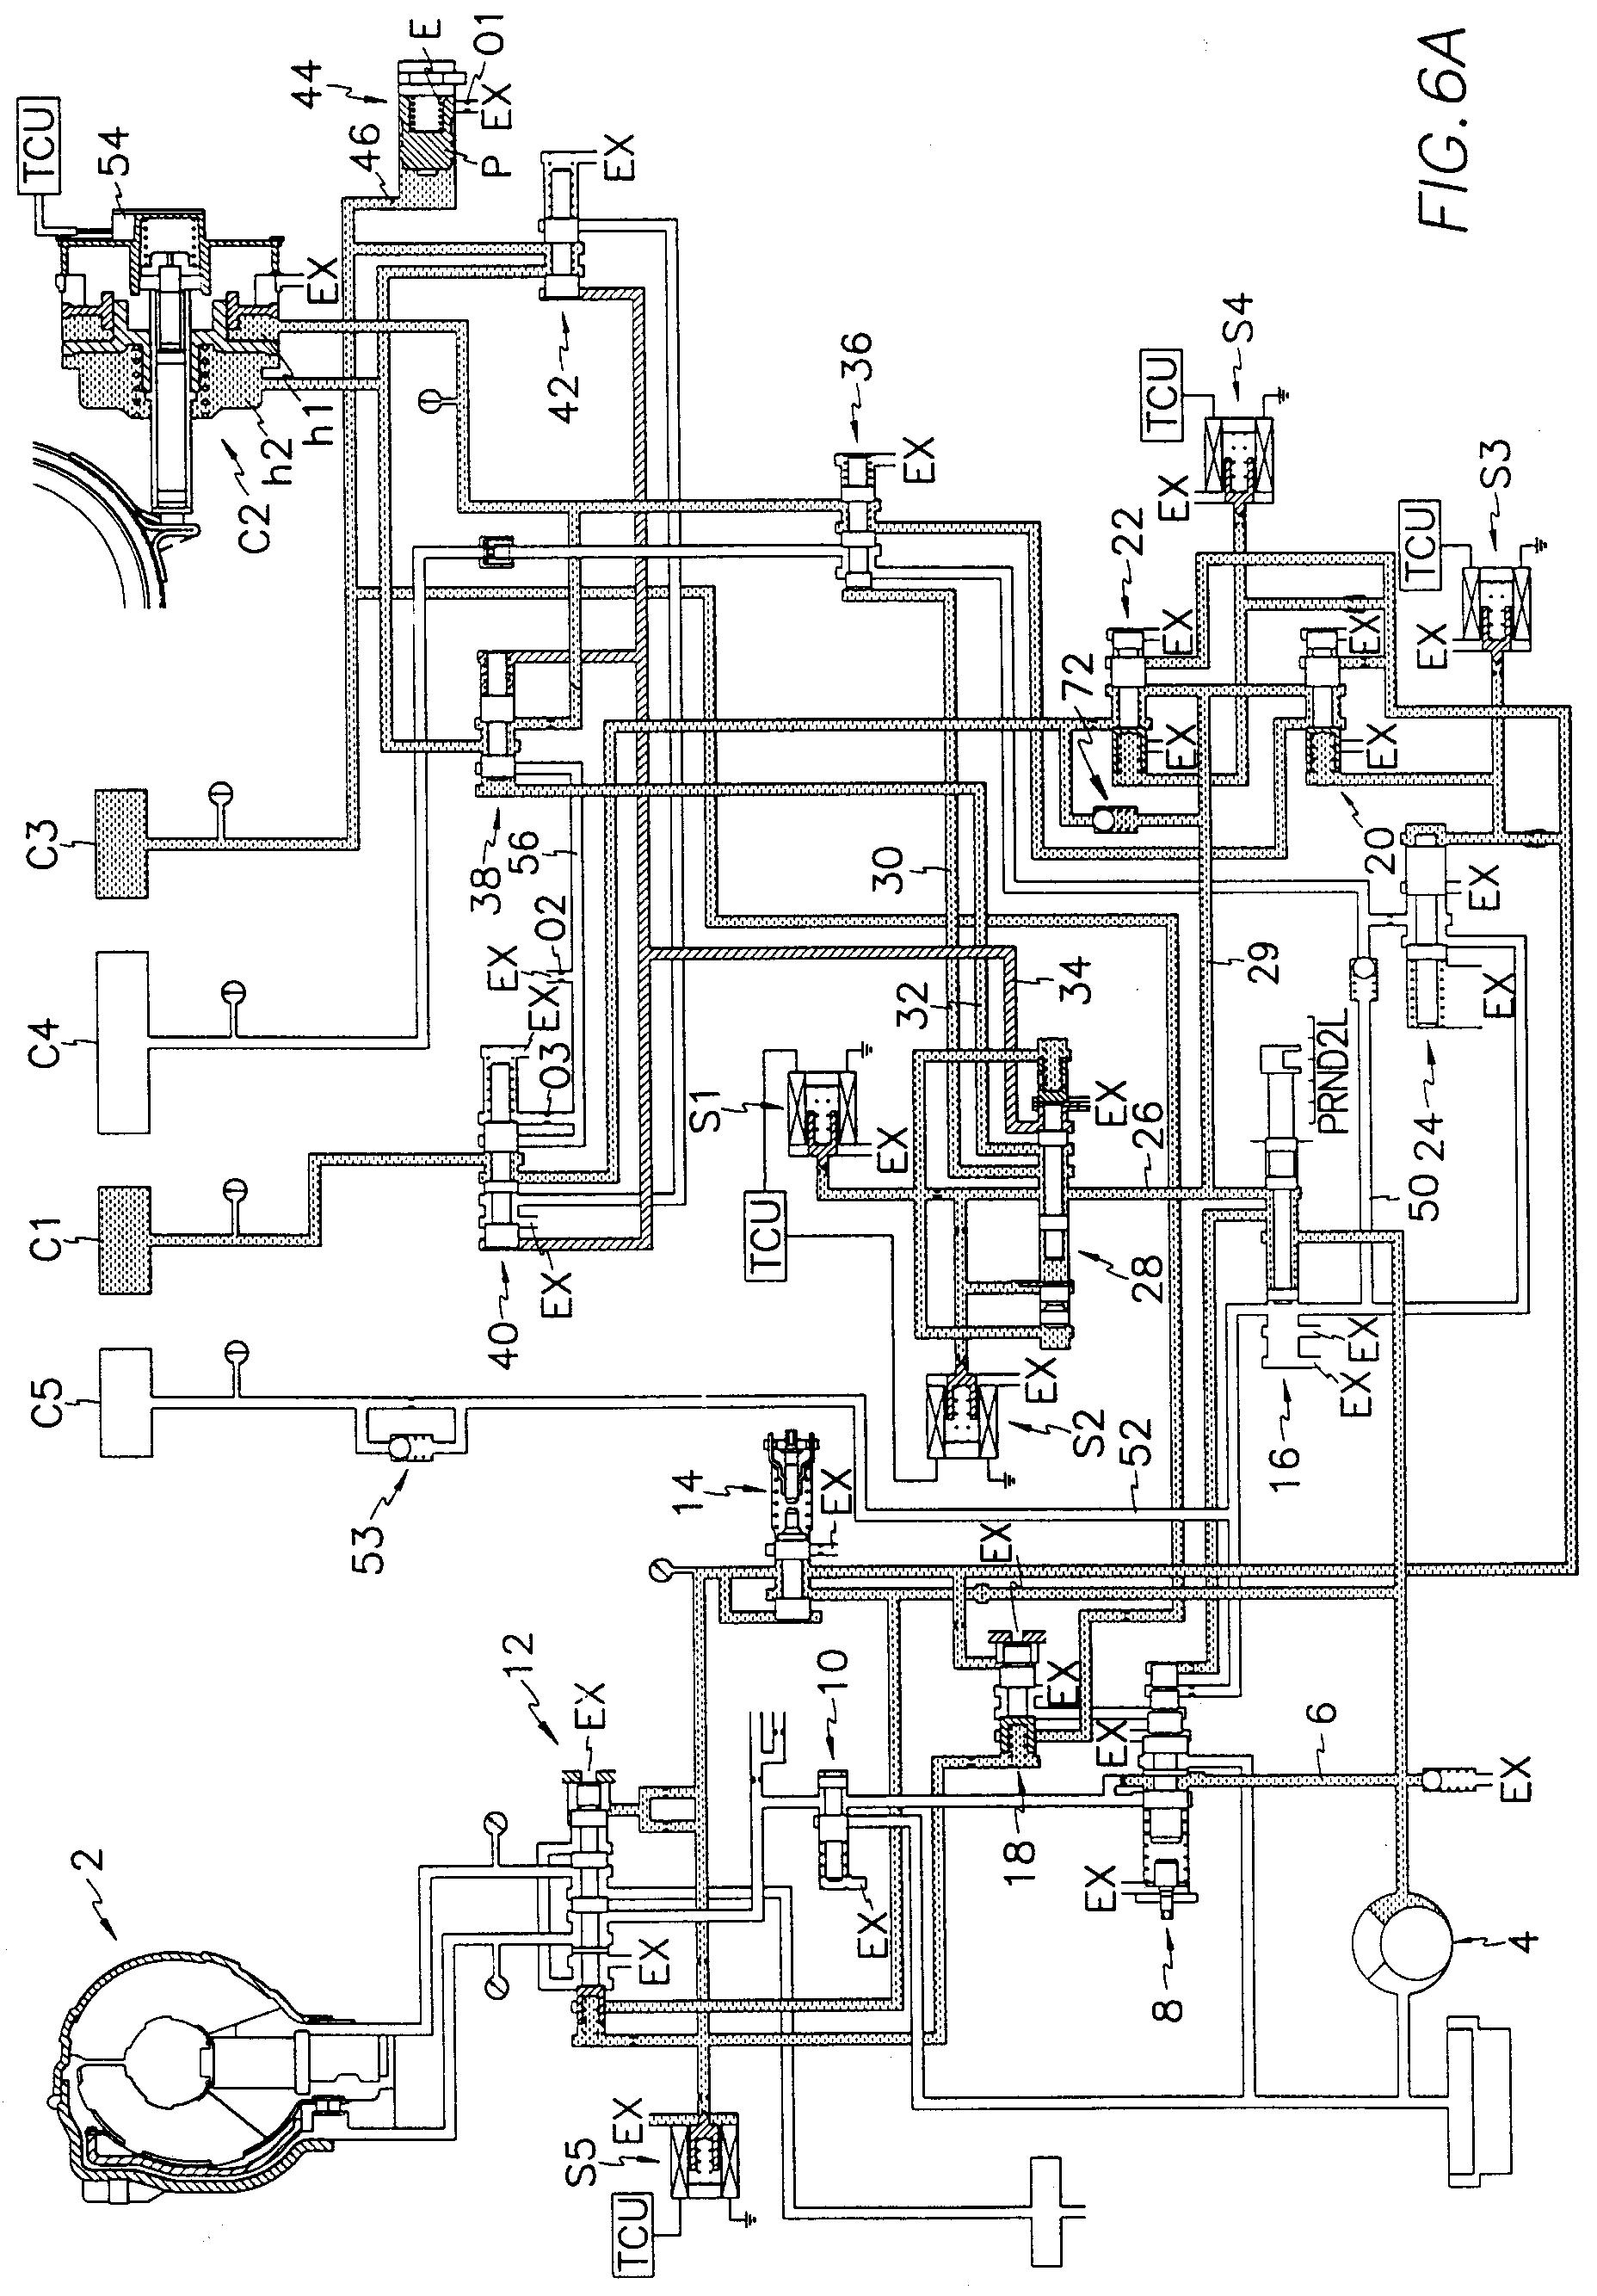 Westwood Mower Wiring Diagram Google Search Fig 6a Pinterest Cooper Mini Morris Figs